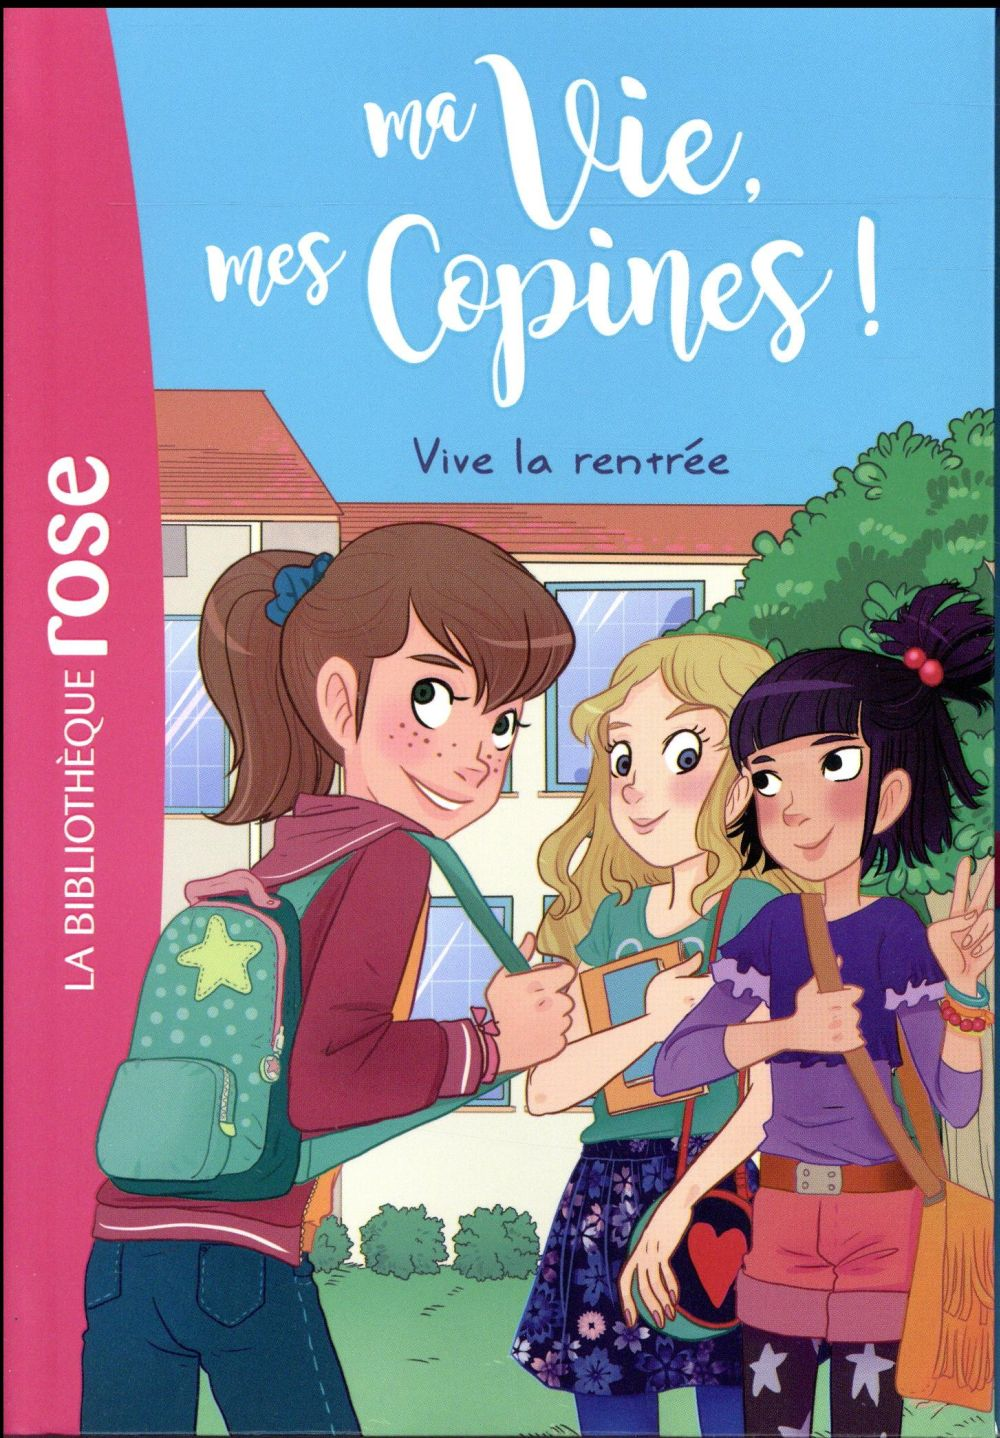 MA VIE, MES COPINES - T01 - MA VIE, MES COPINES 01 - VIVE LA RENTREE ! KALENGULA CATHERINE Hachette Jeunesse